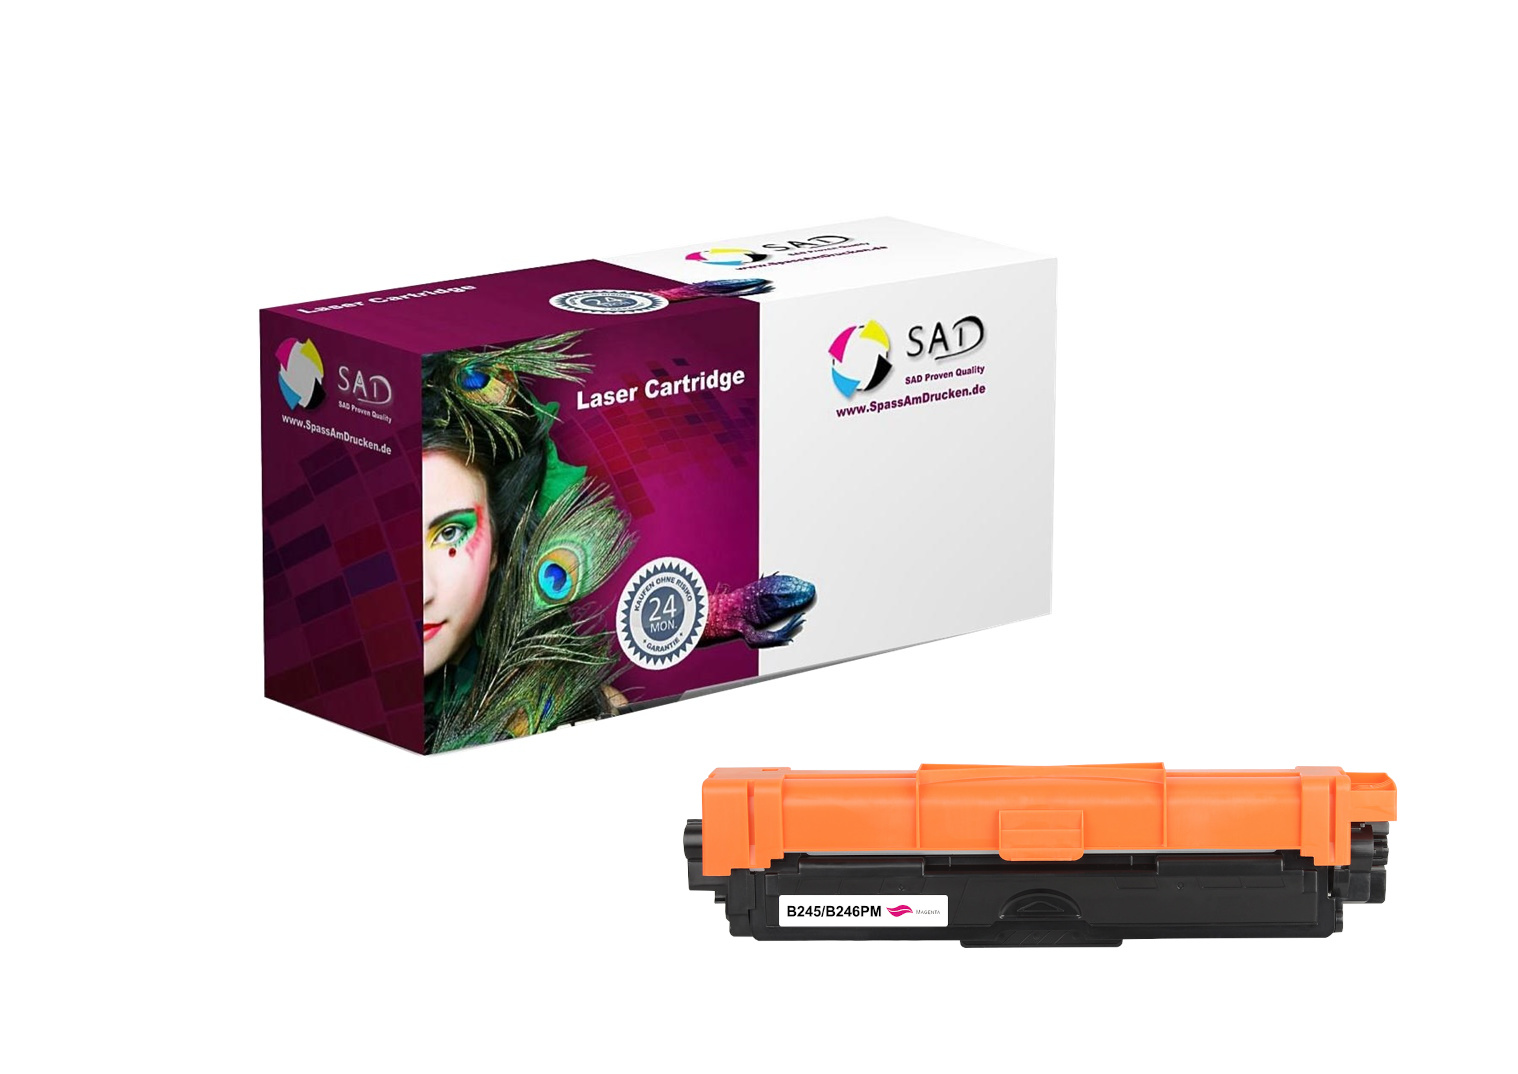 SAD Premium Toner komp. zu Brother TN-245M / TN-246M magenta ca. 2.200 Seiten